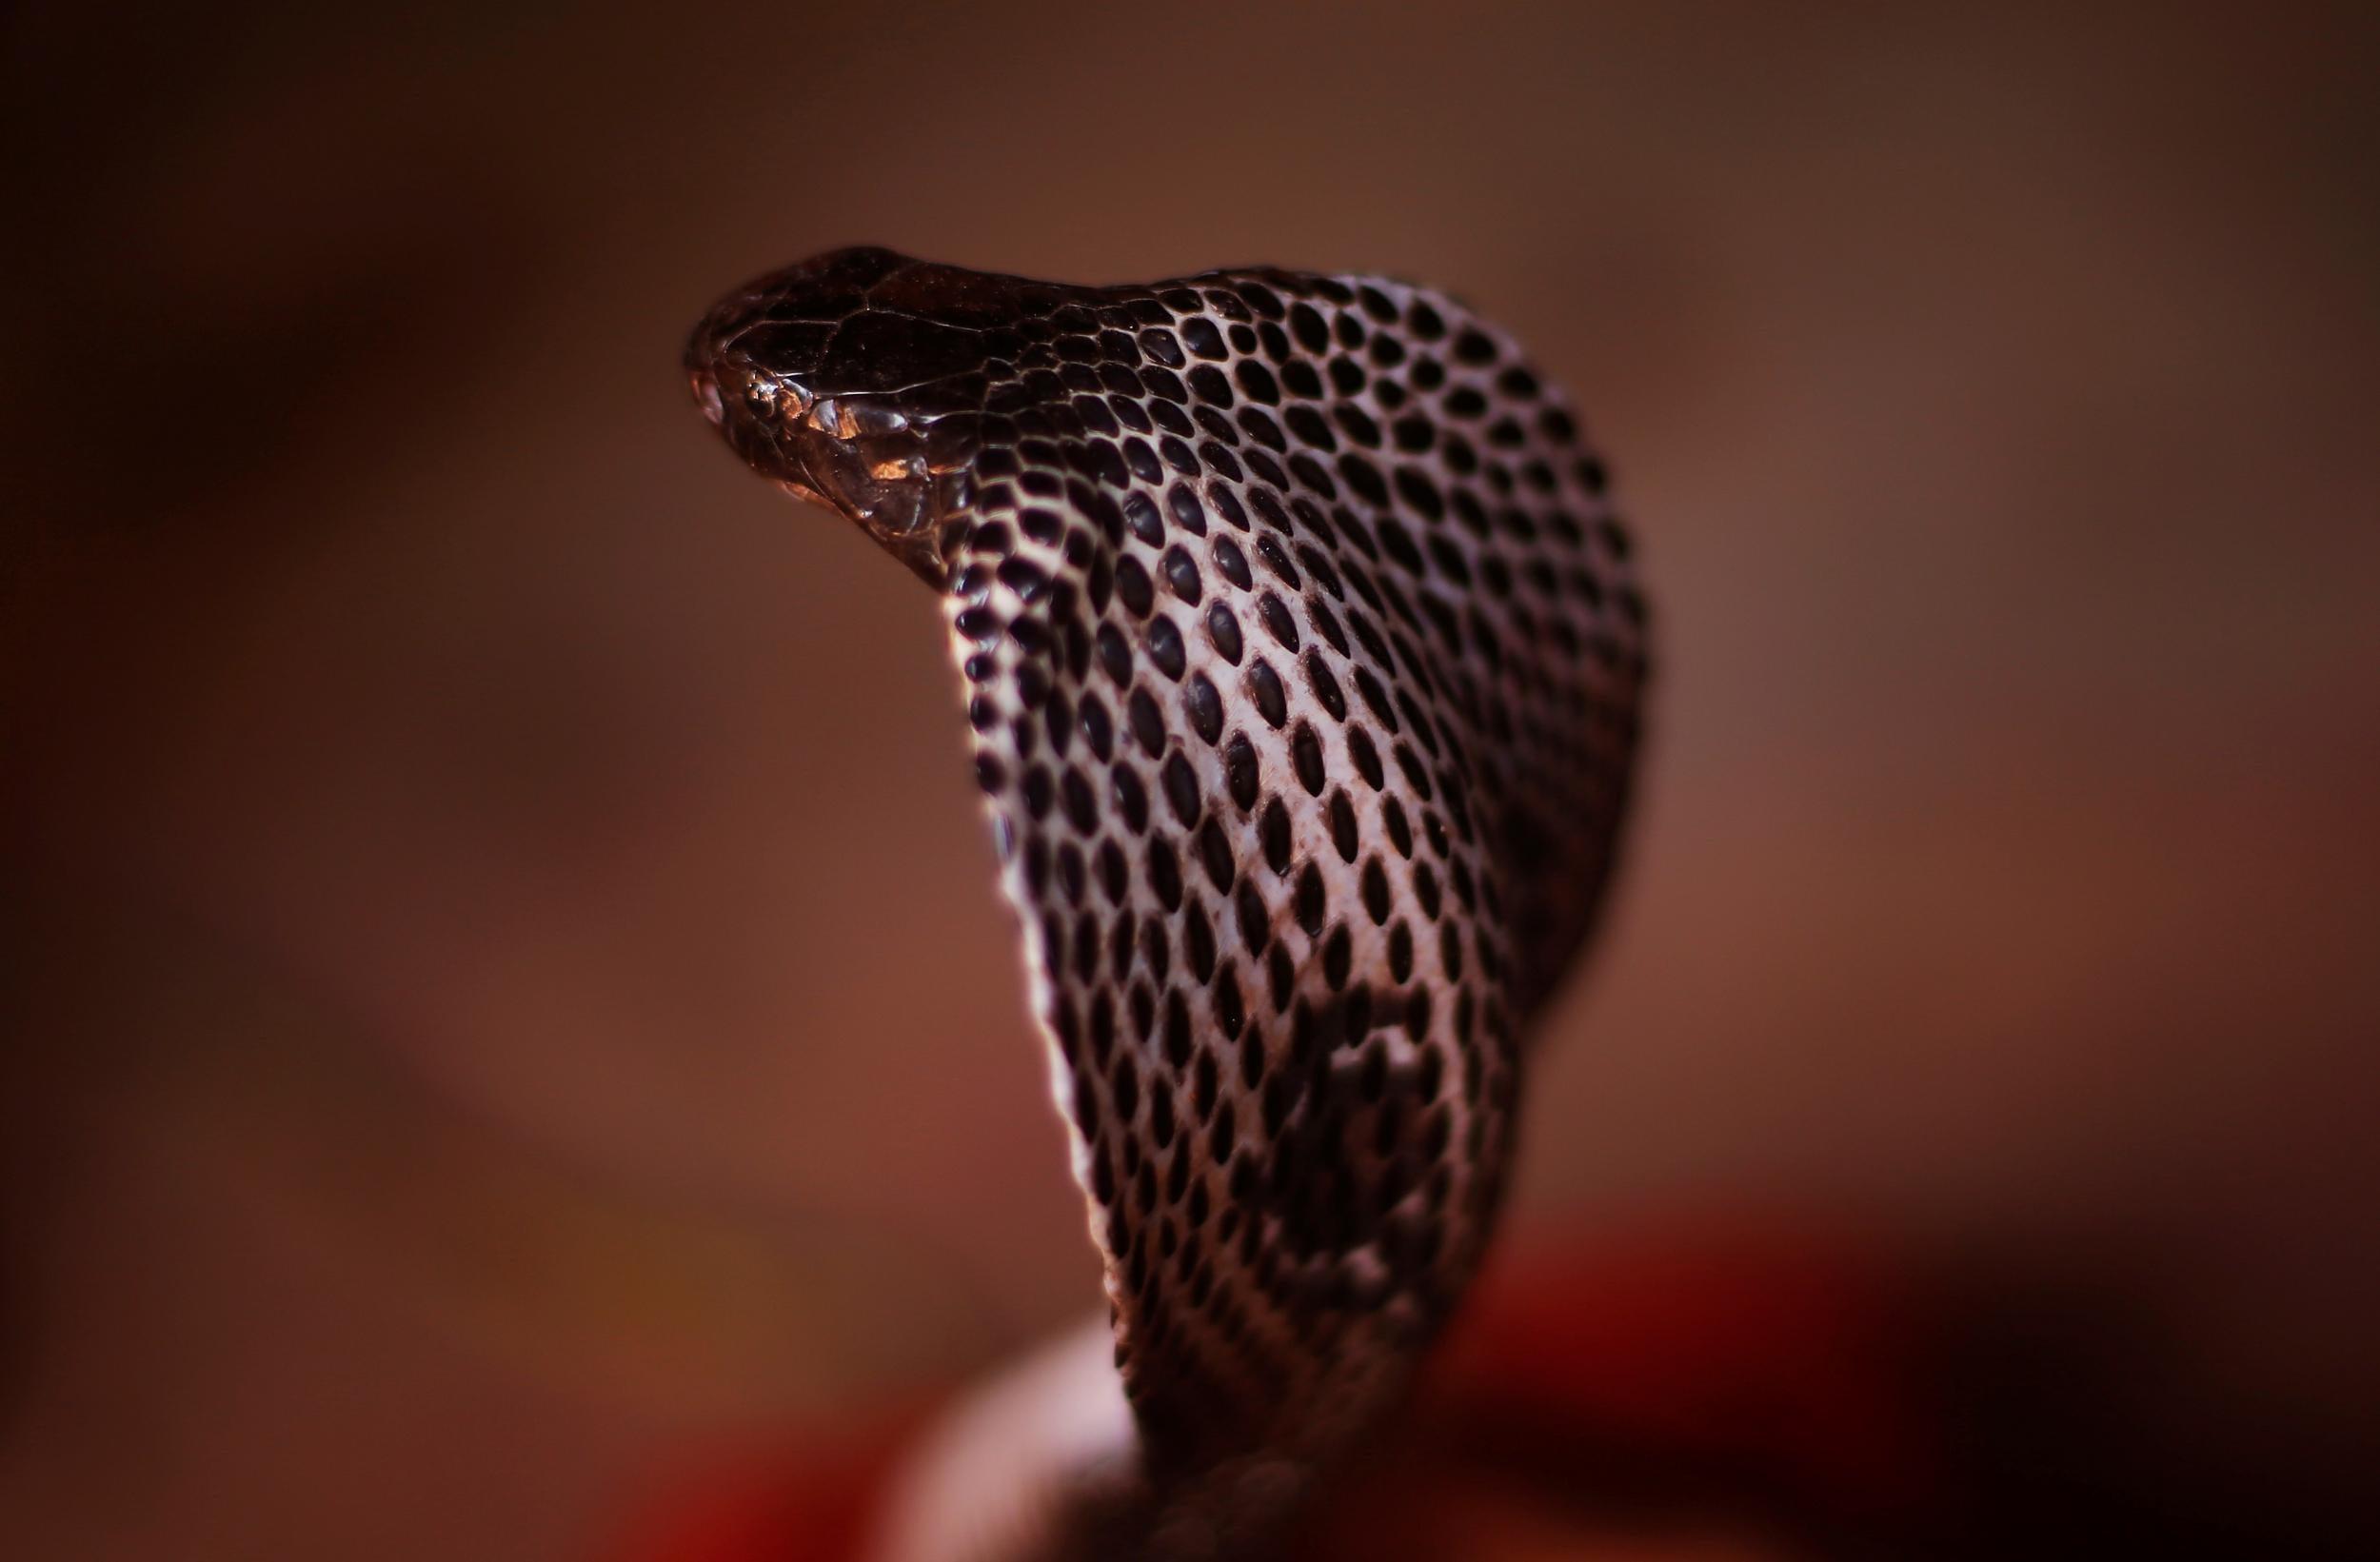 Multistate hunt for antivenom after exotic snake attacks Michigan man